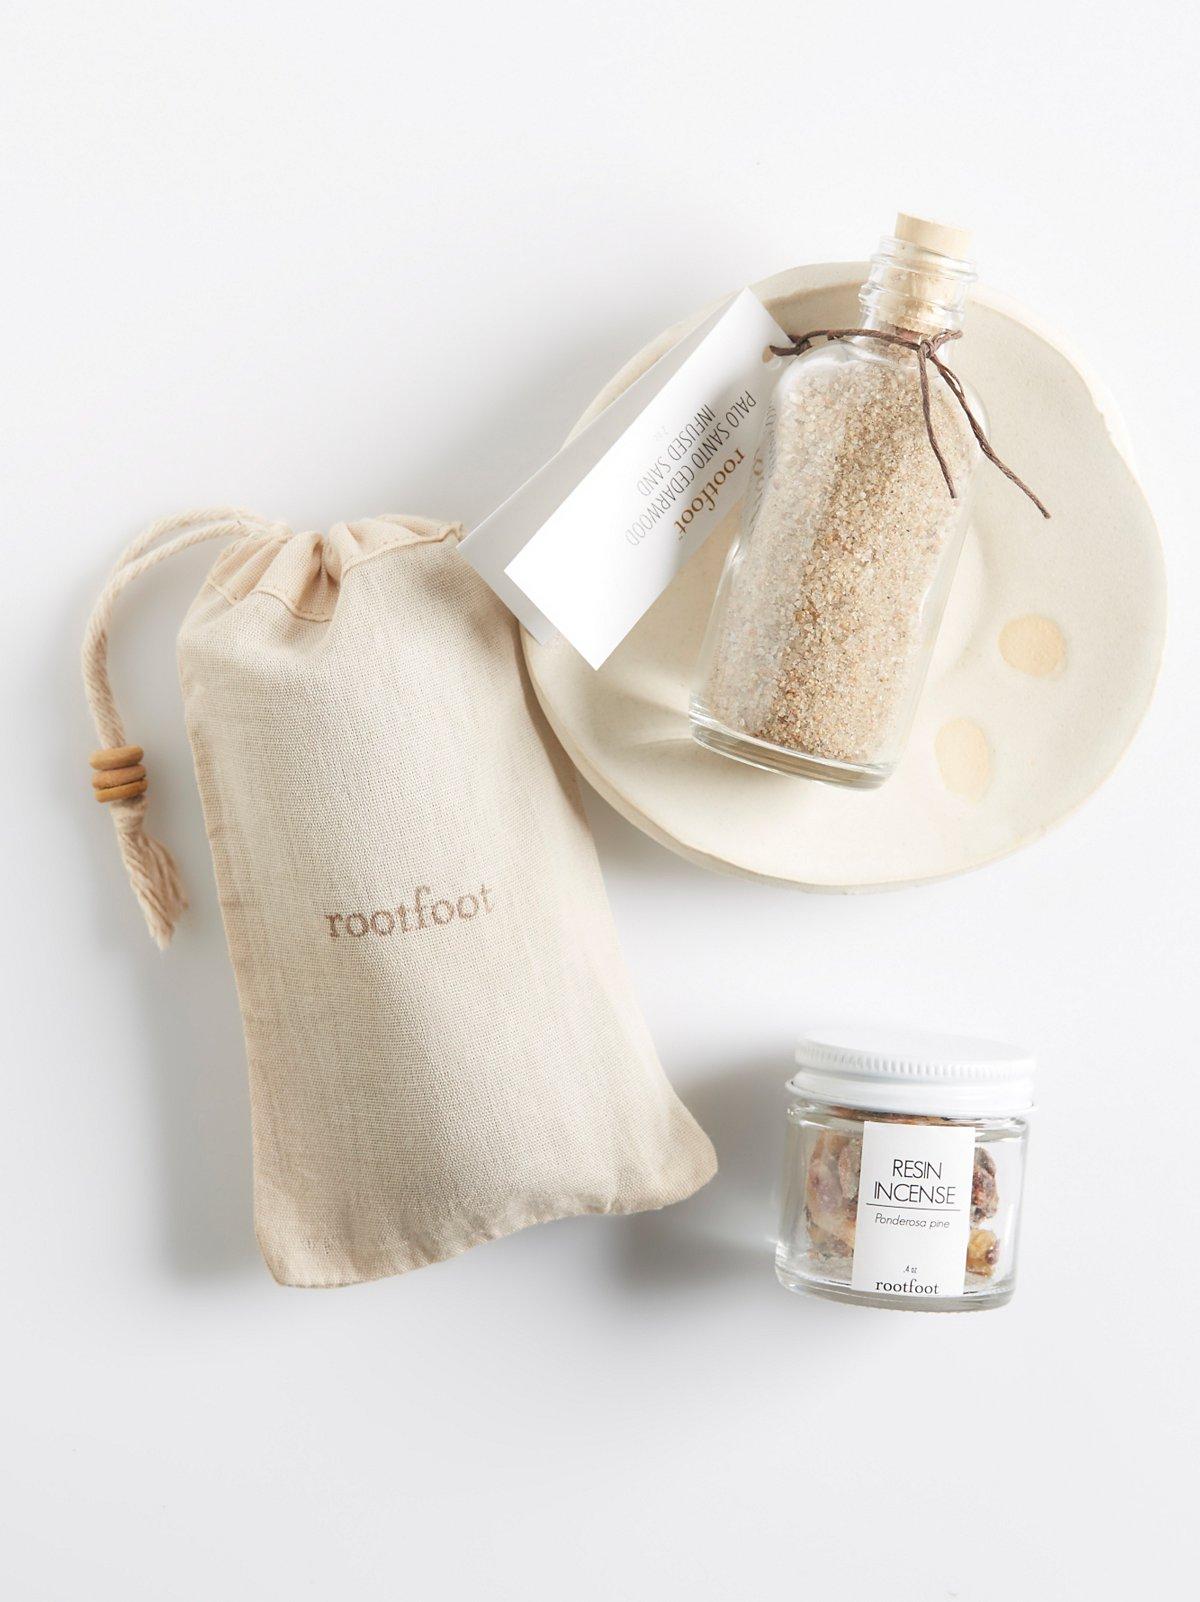 Resin Incense Kit